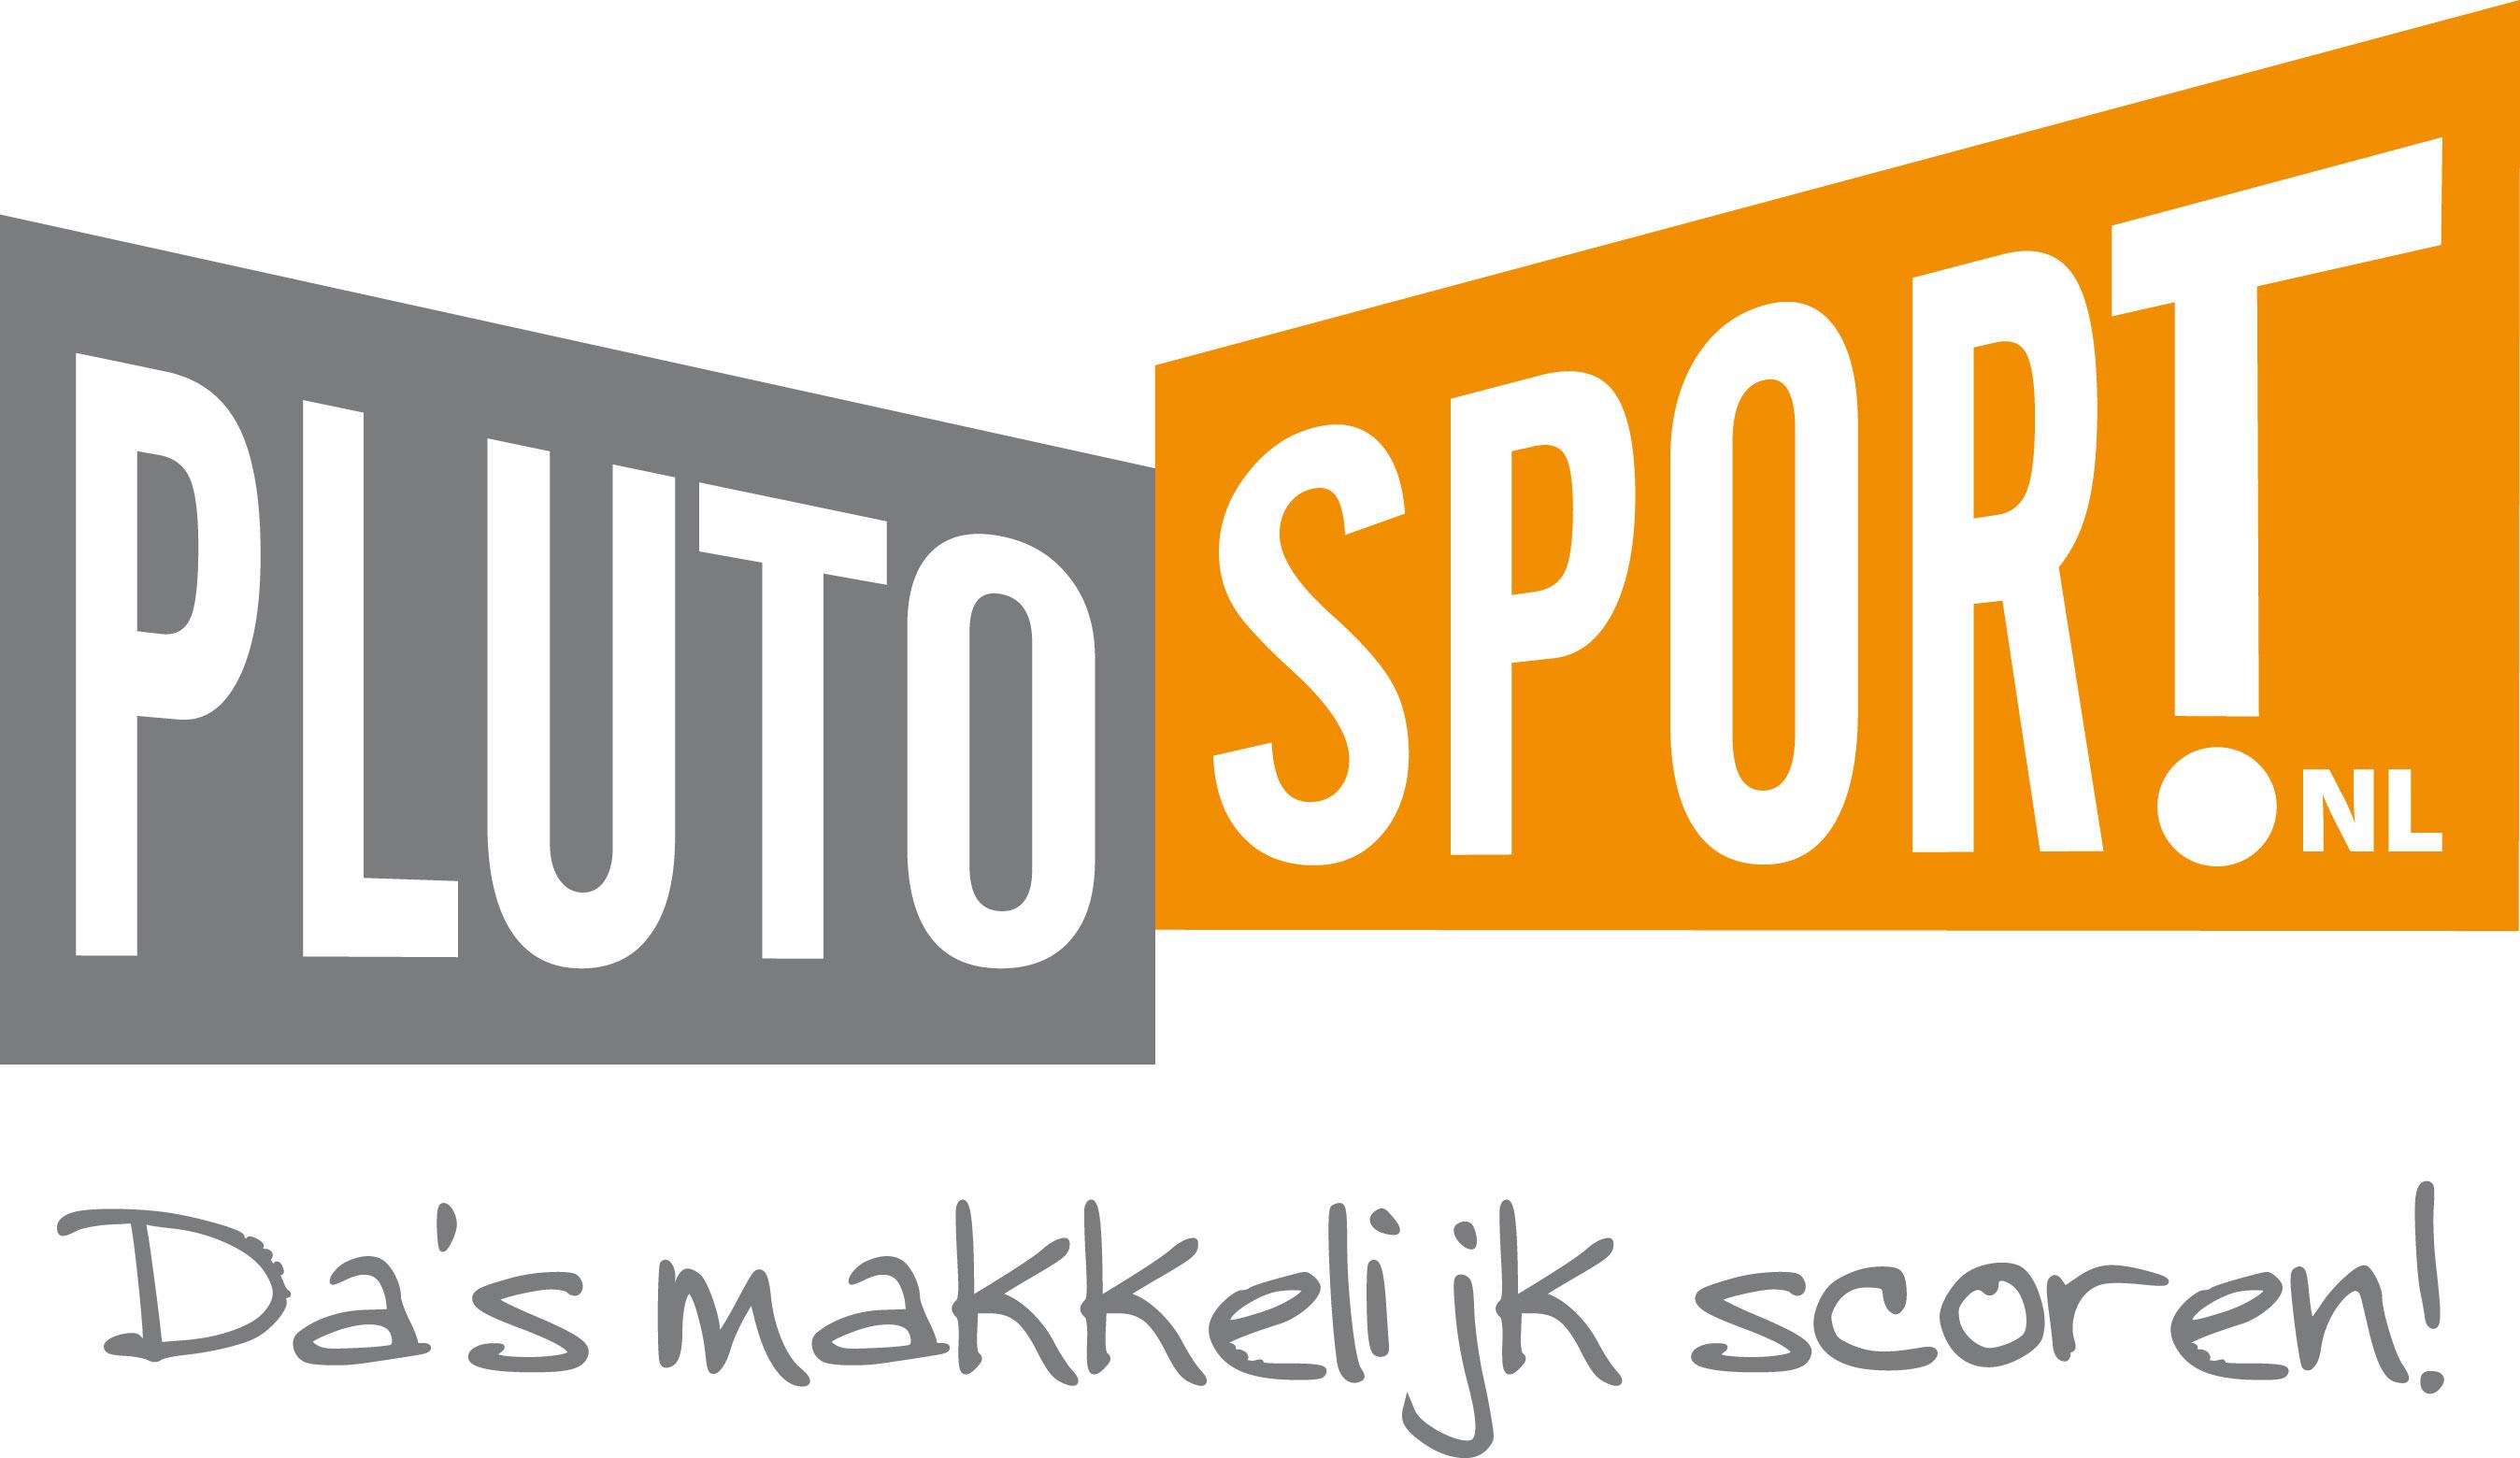 SALE tot 65% + €7,50 korting @ Plutosport